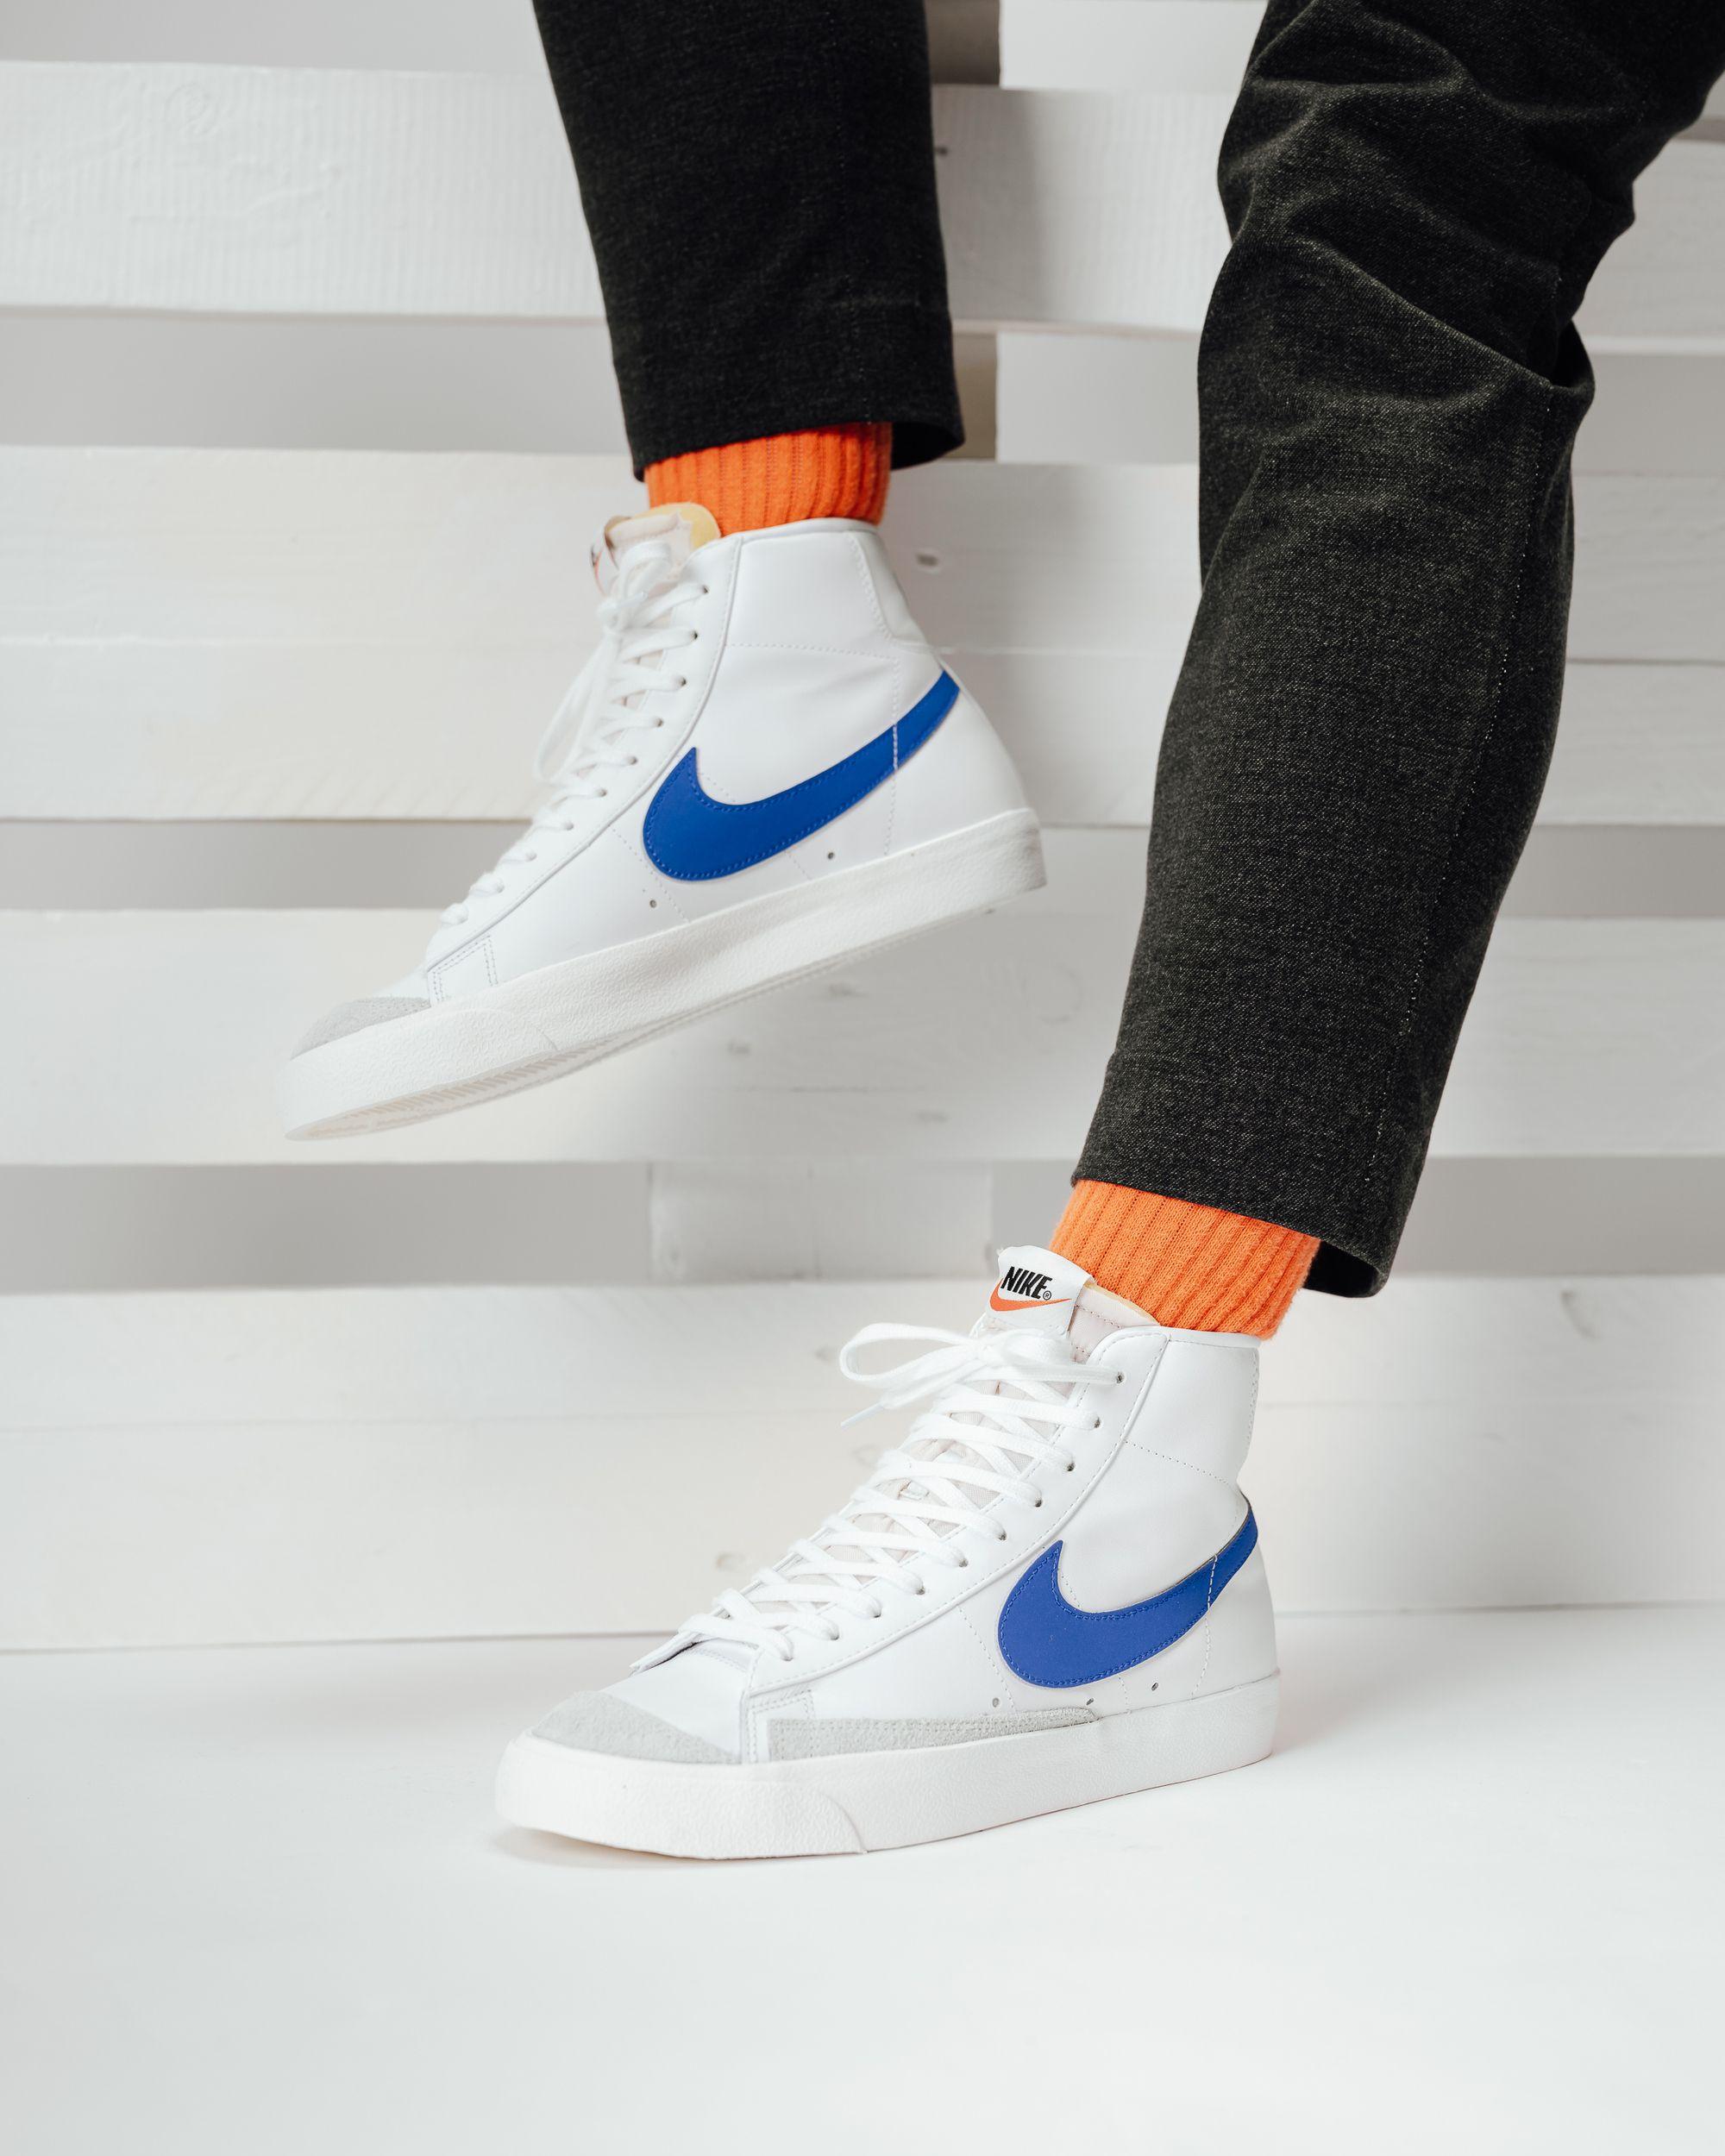 Nike Blazer Mid 77 Vntg Blue In 2020 Nike Blazers Outfit Nike Blazer Mens Nike Shoes